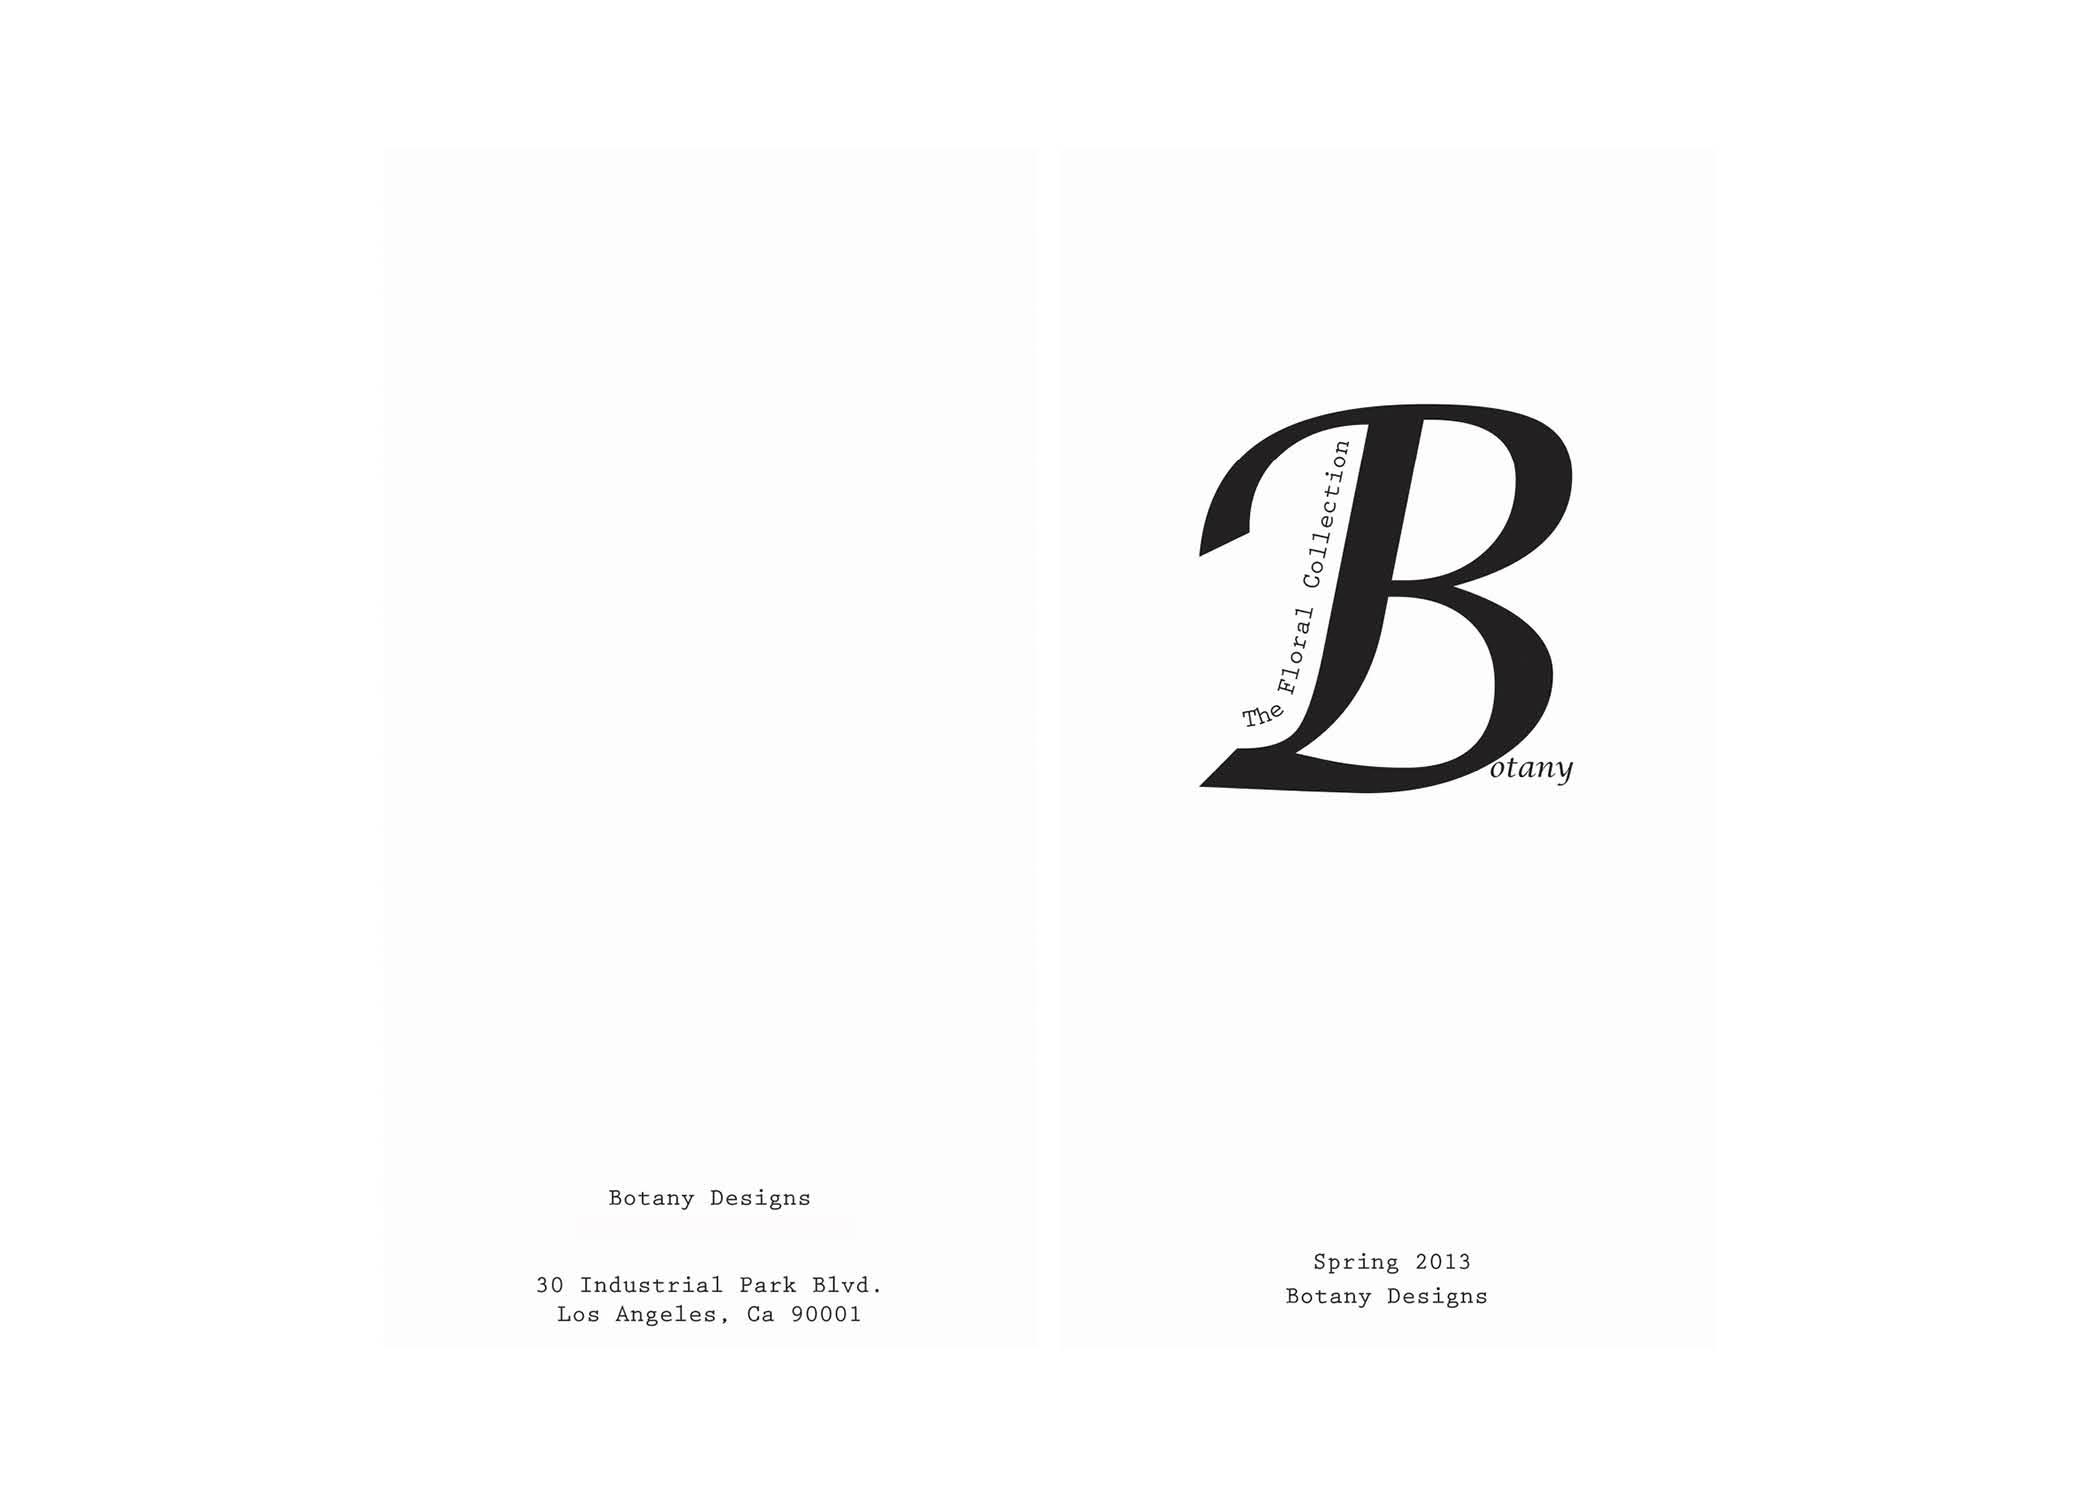 Composition_Botany.jpg